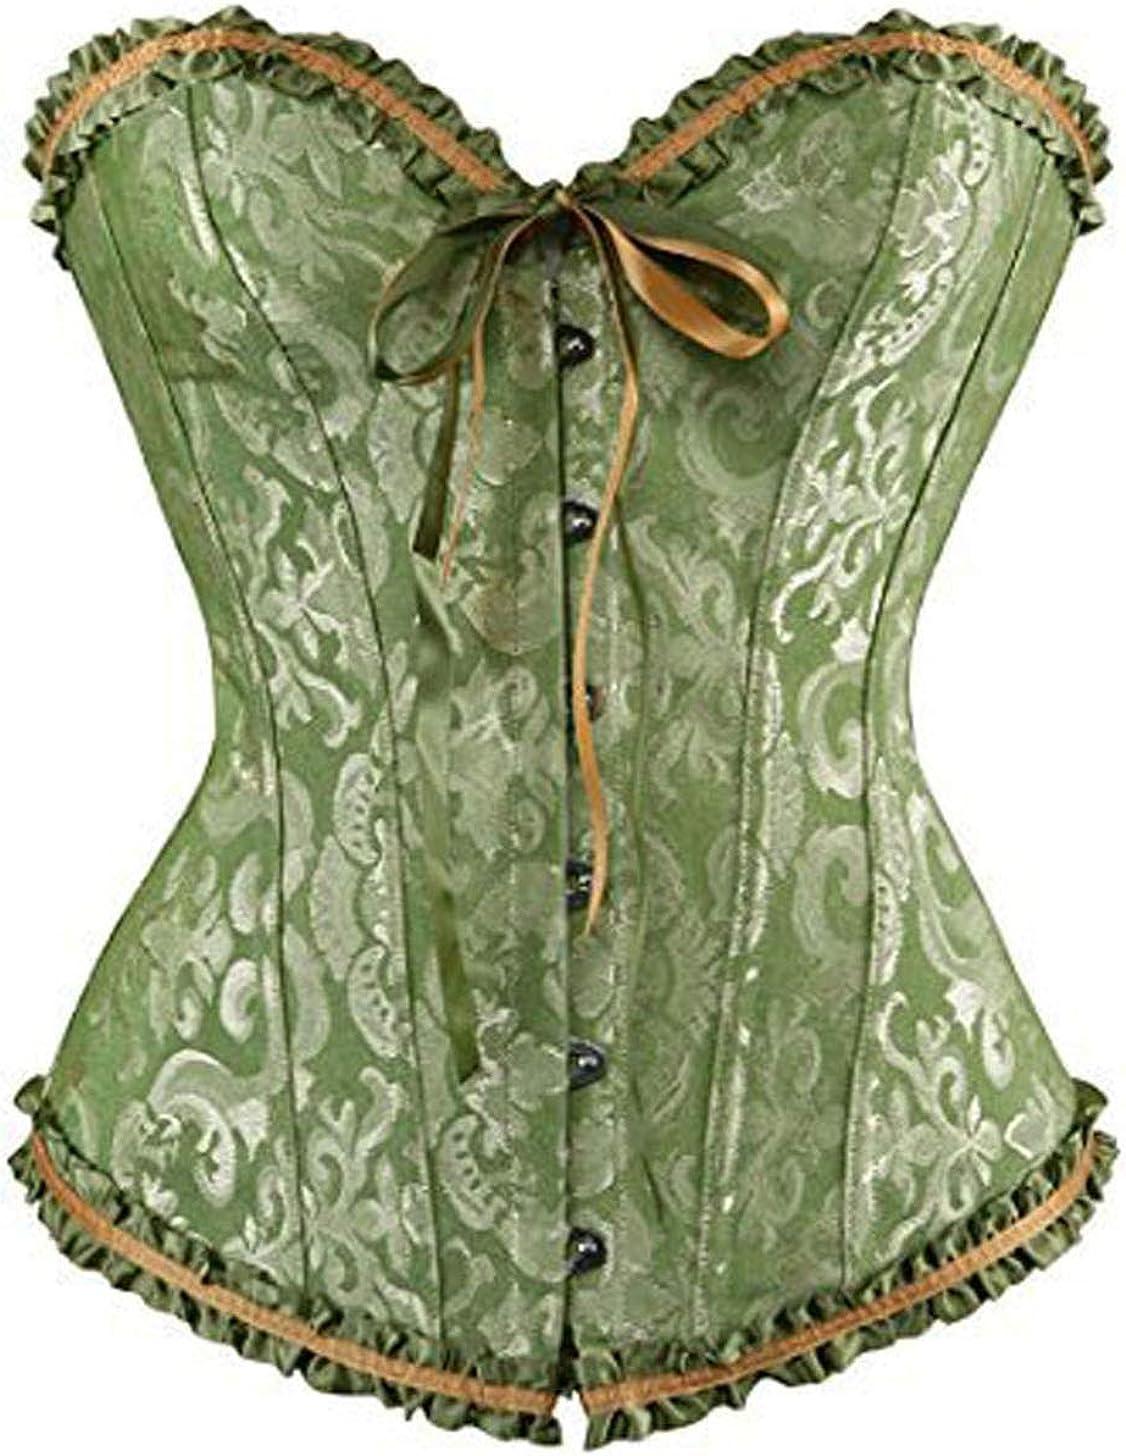 Details about  /Womens Lace Up Overbust Waist Training Boned Corset Top Bustier Shaper Plus Size